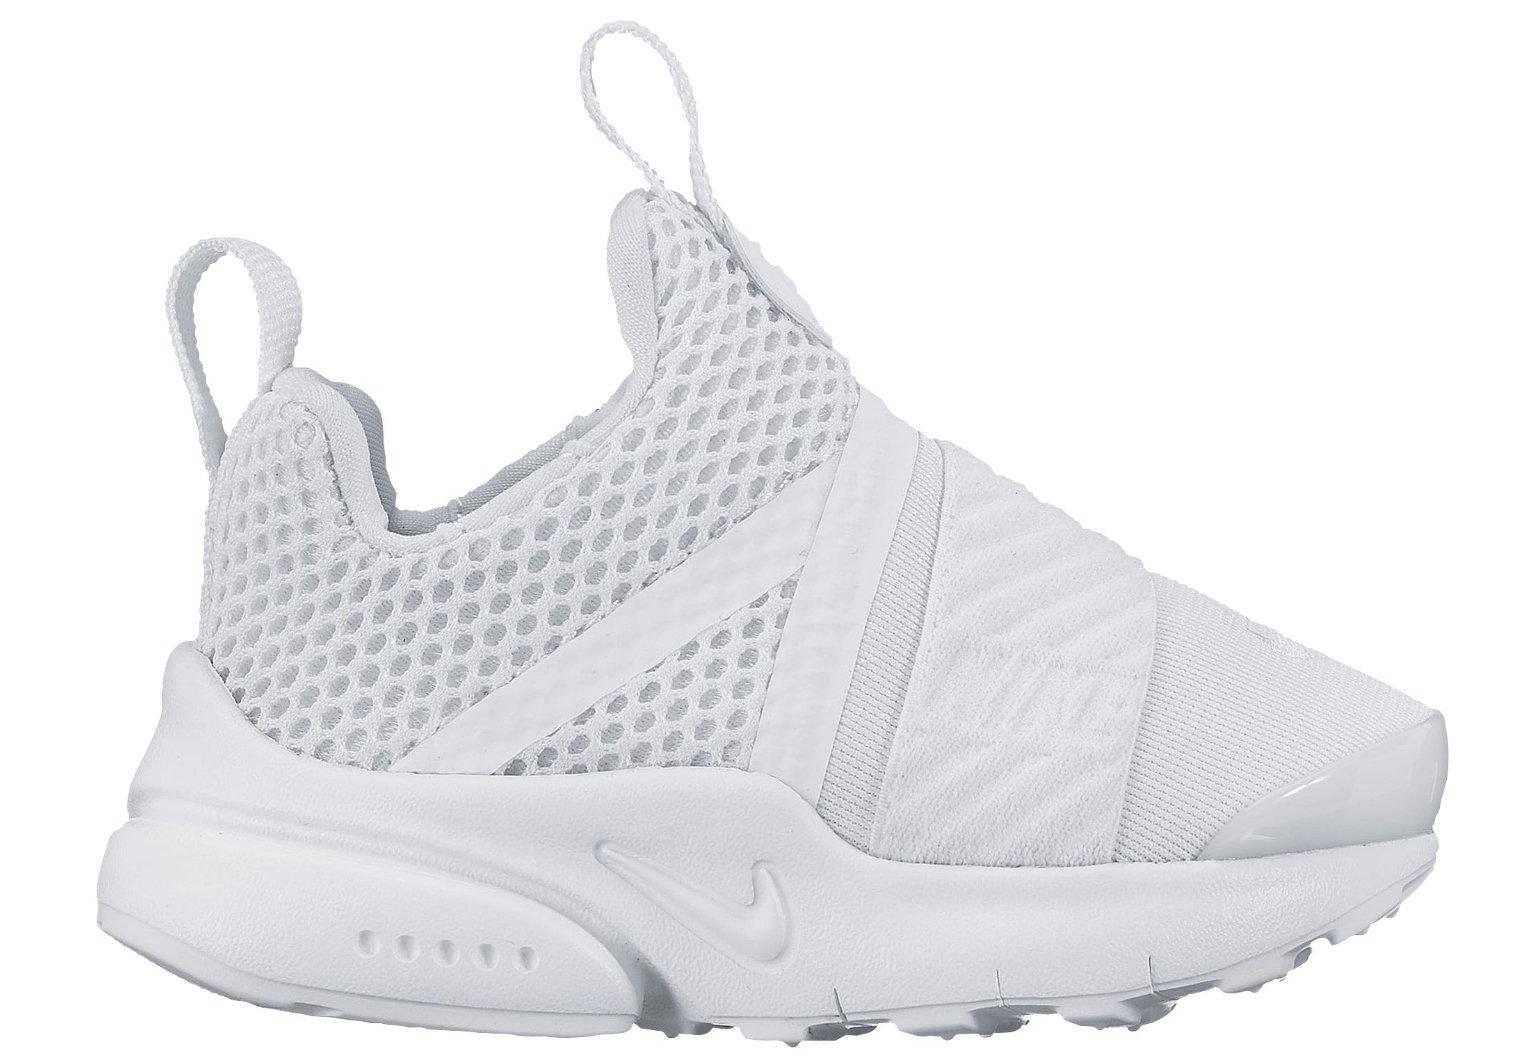 Galleon - NIKE Presto Extreme Toddler s Running Shoes White White  870019-101 (8 M US) 7496818b8